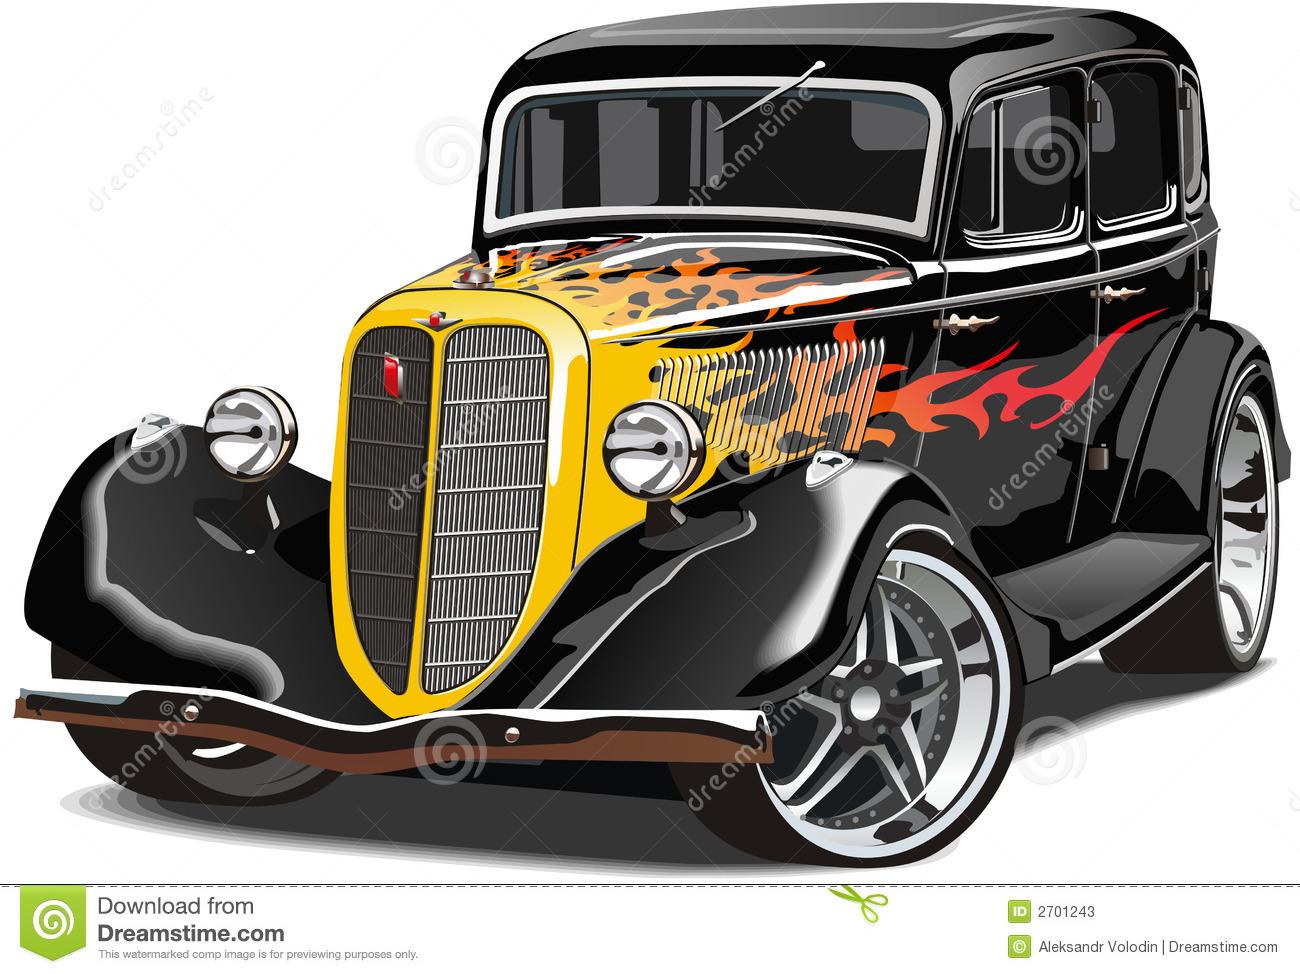 Hot rod cars clipart.